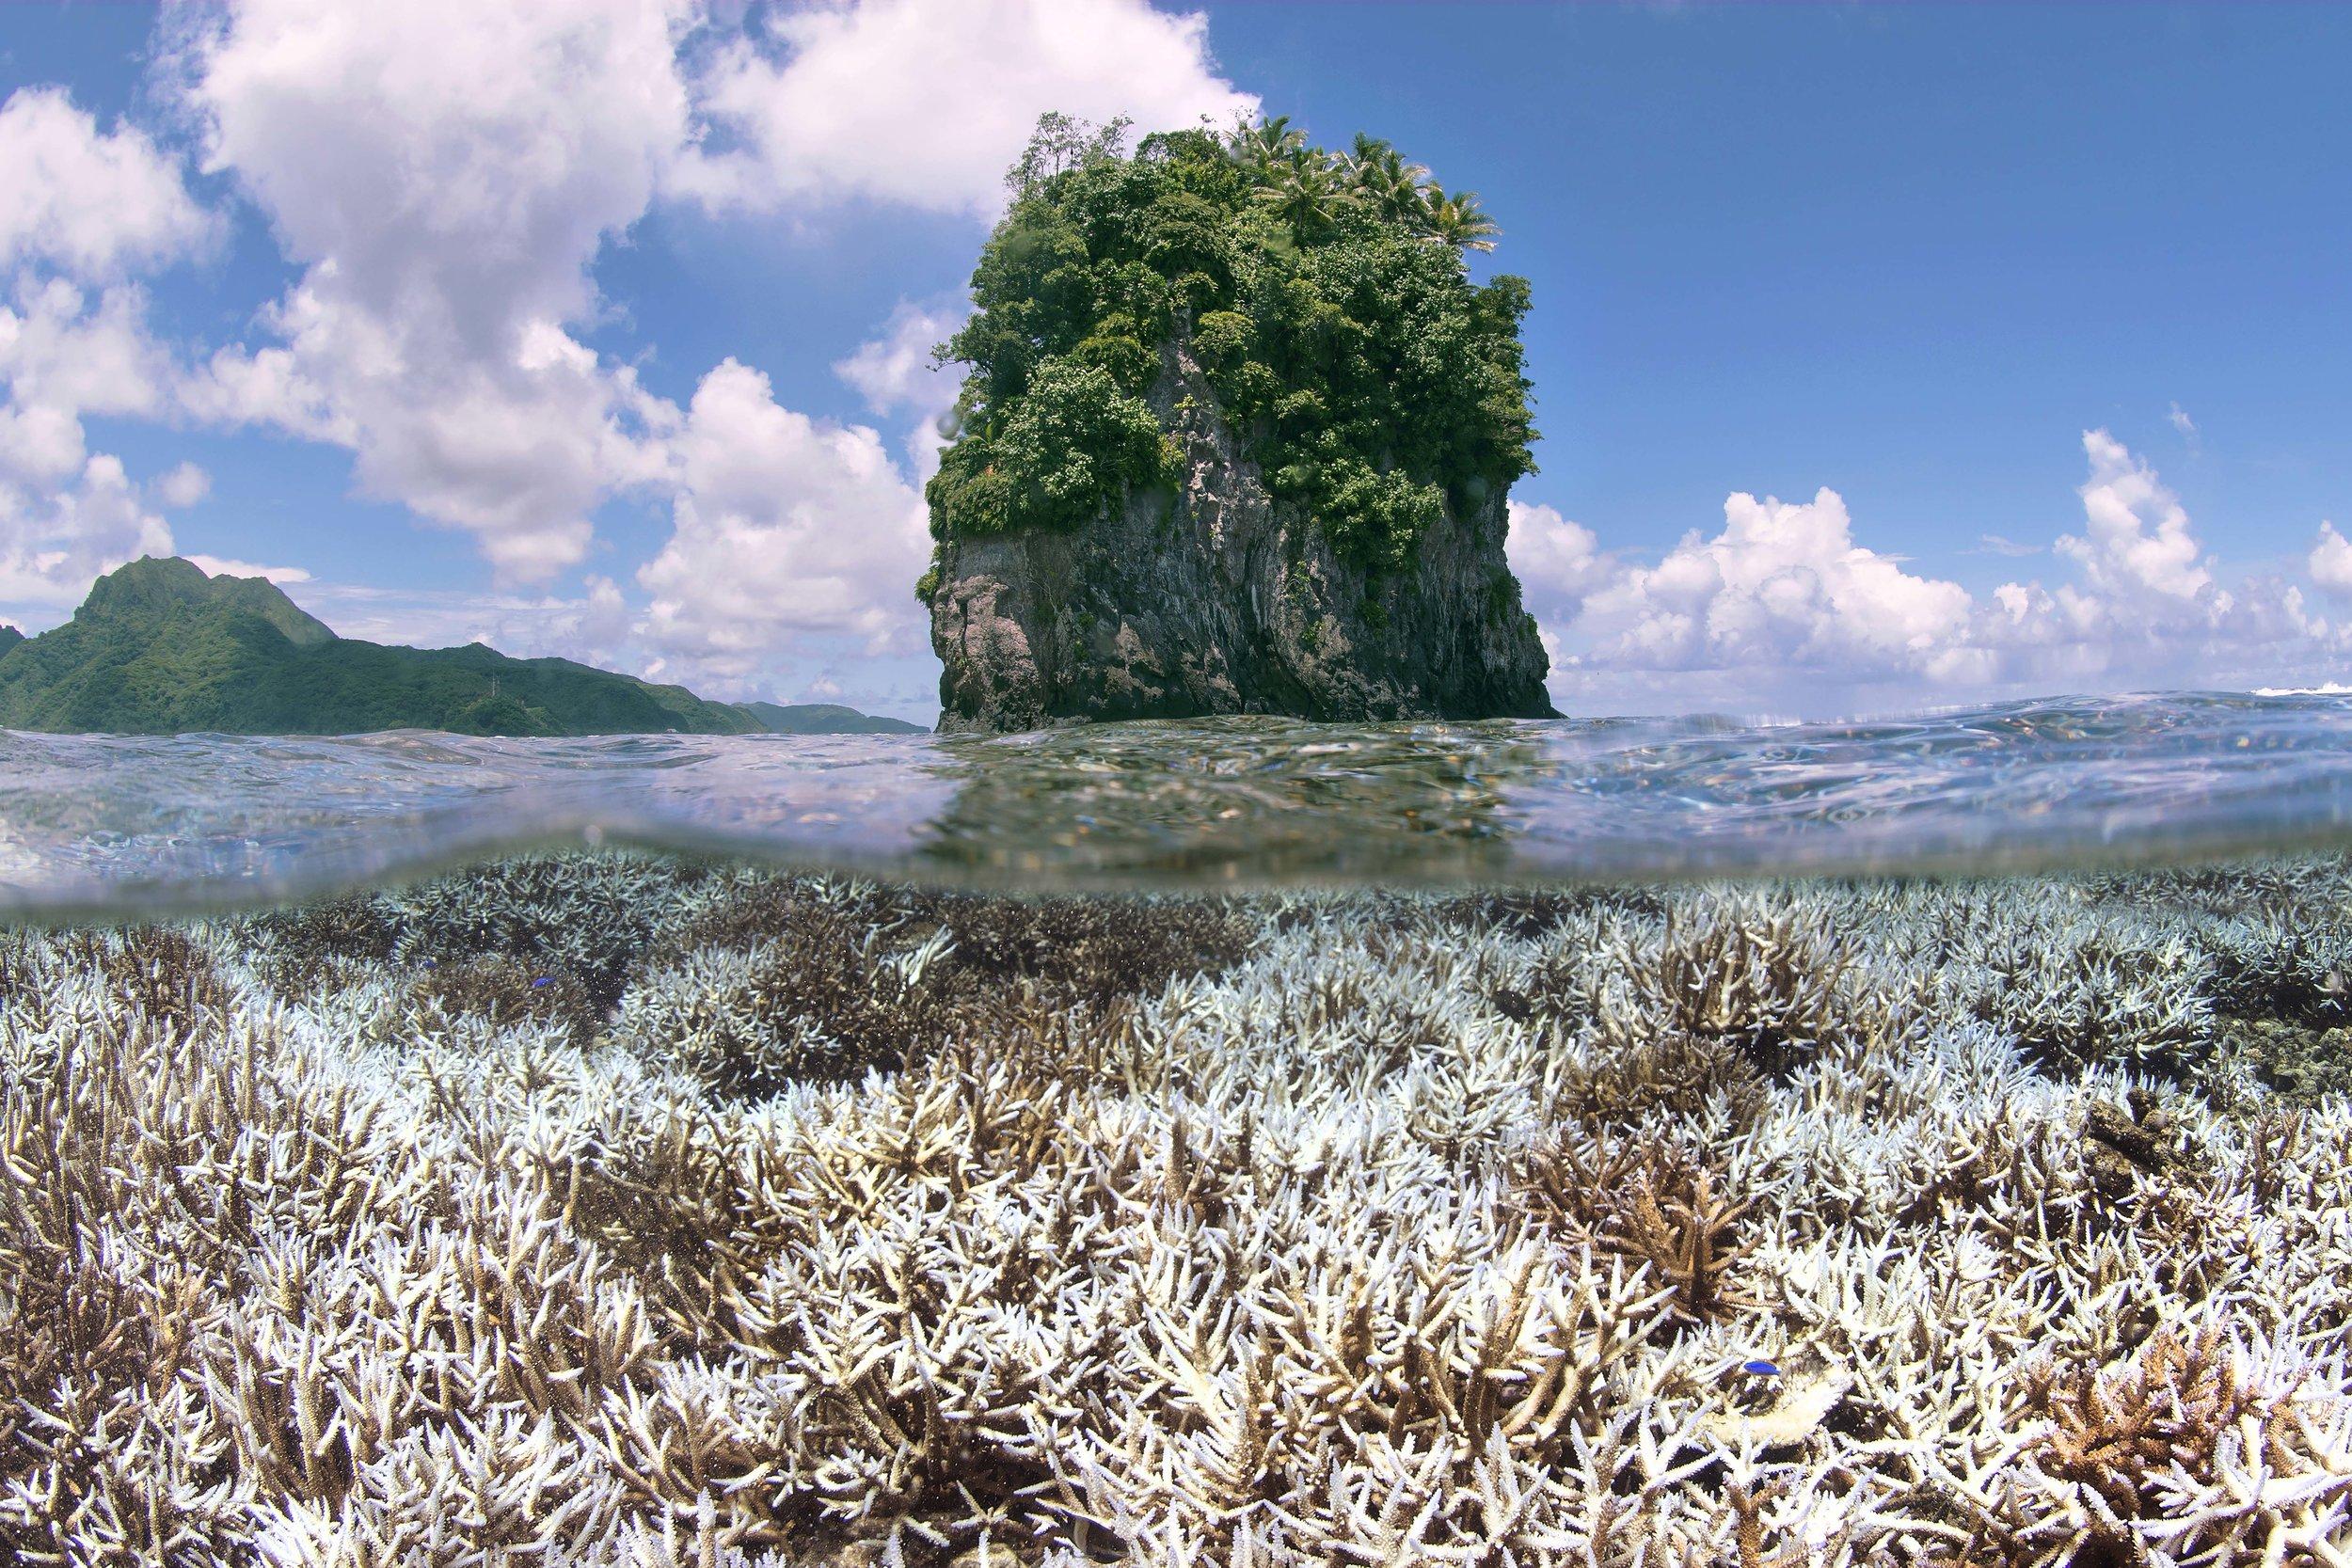 during bleaching - American Samoa - feb 2015 credit: the ocean agency / xl catlin seaview survey/